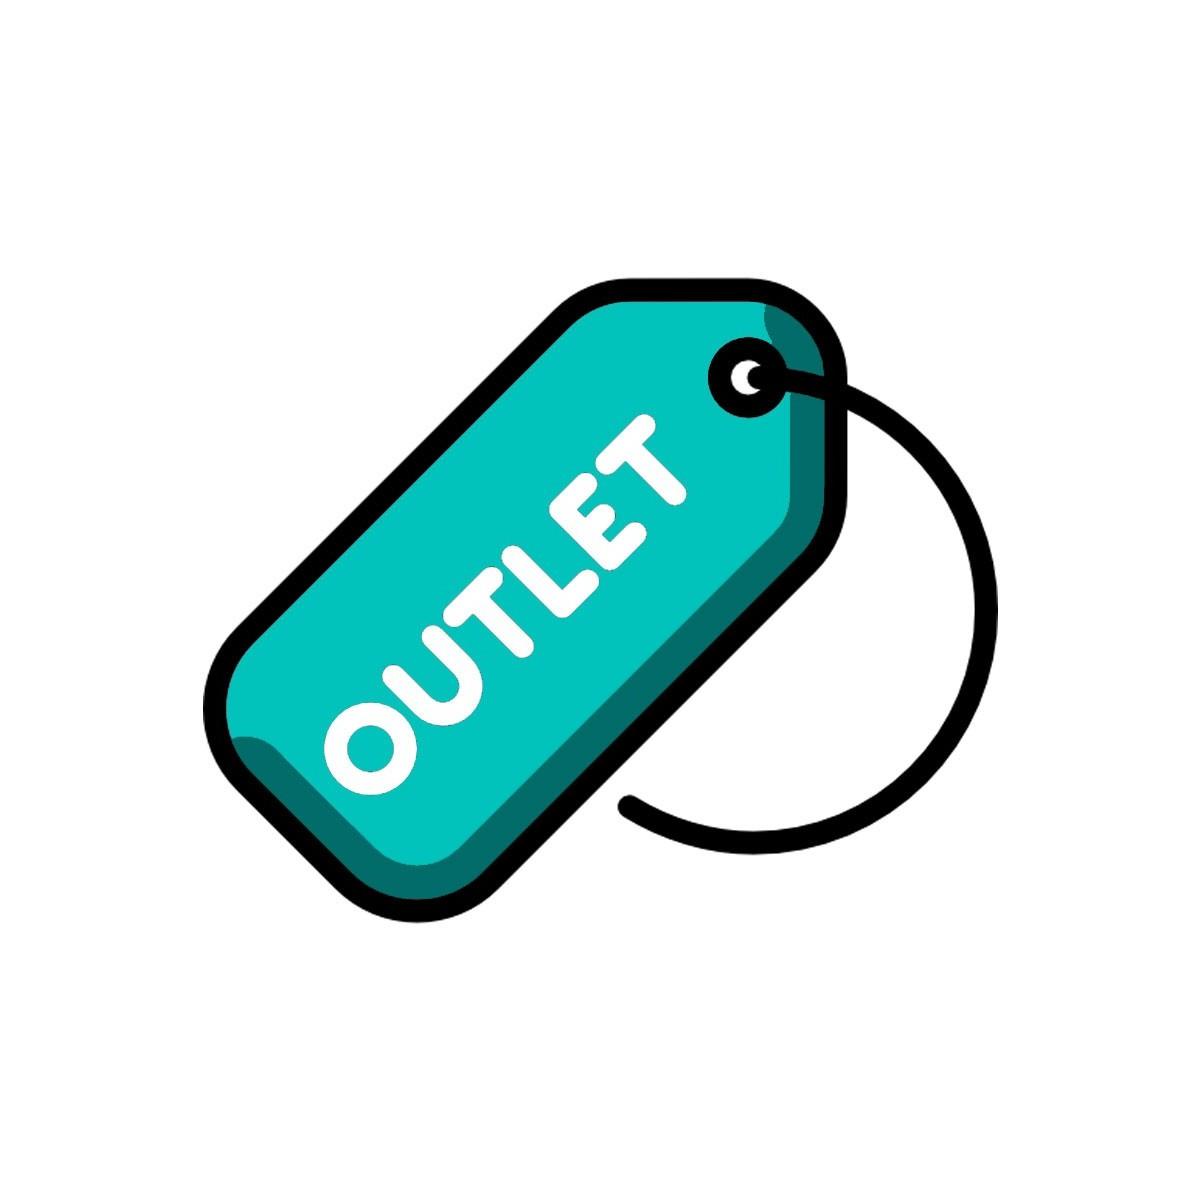 OUTLET / LIQ